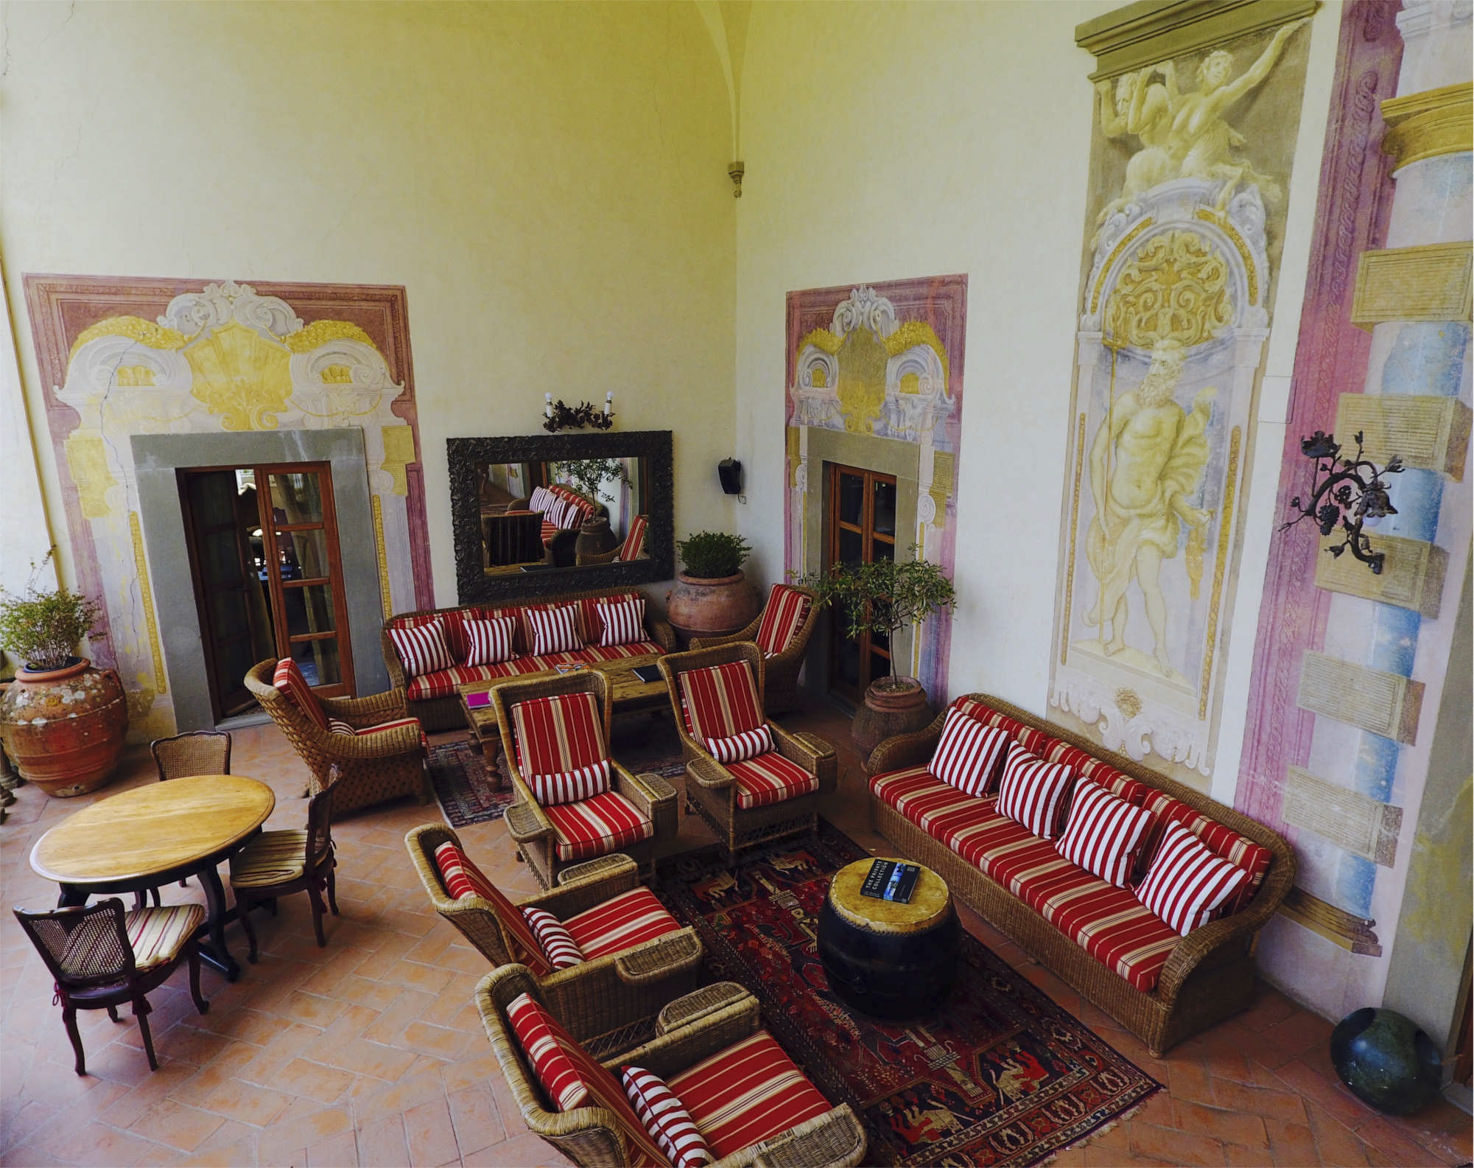 Loggia with Renaissance frescoes